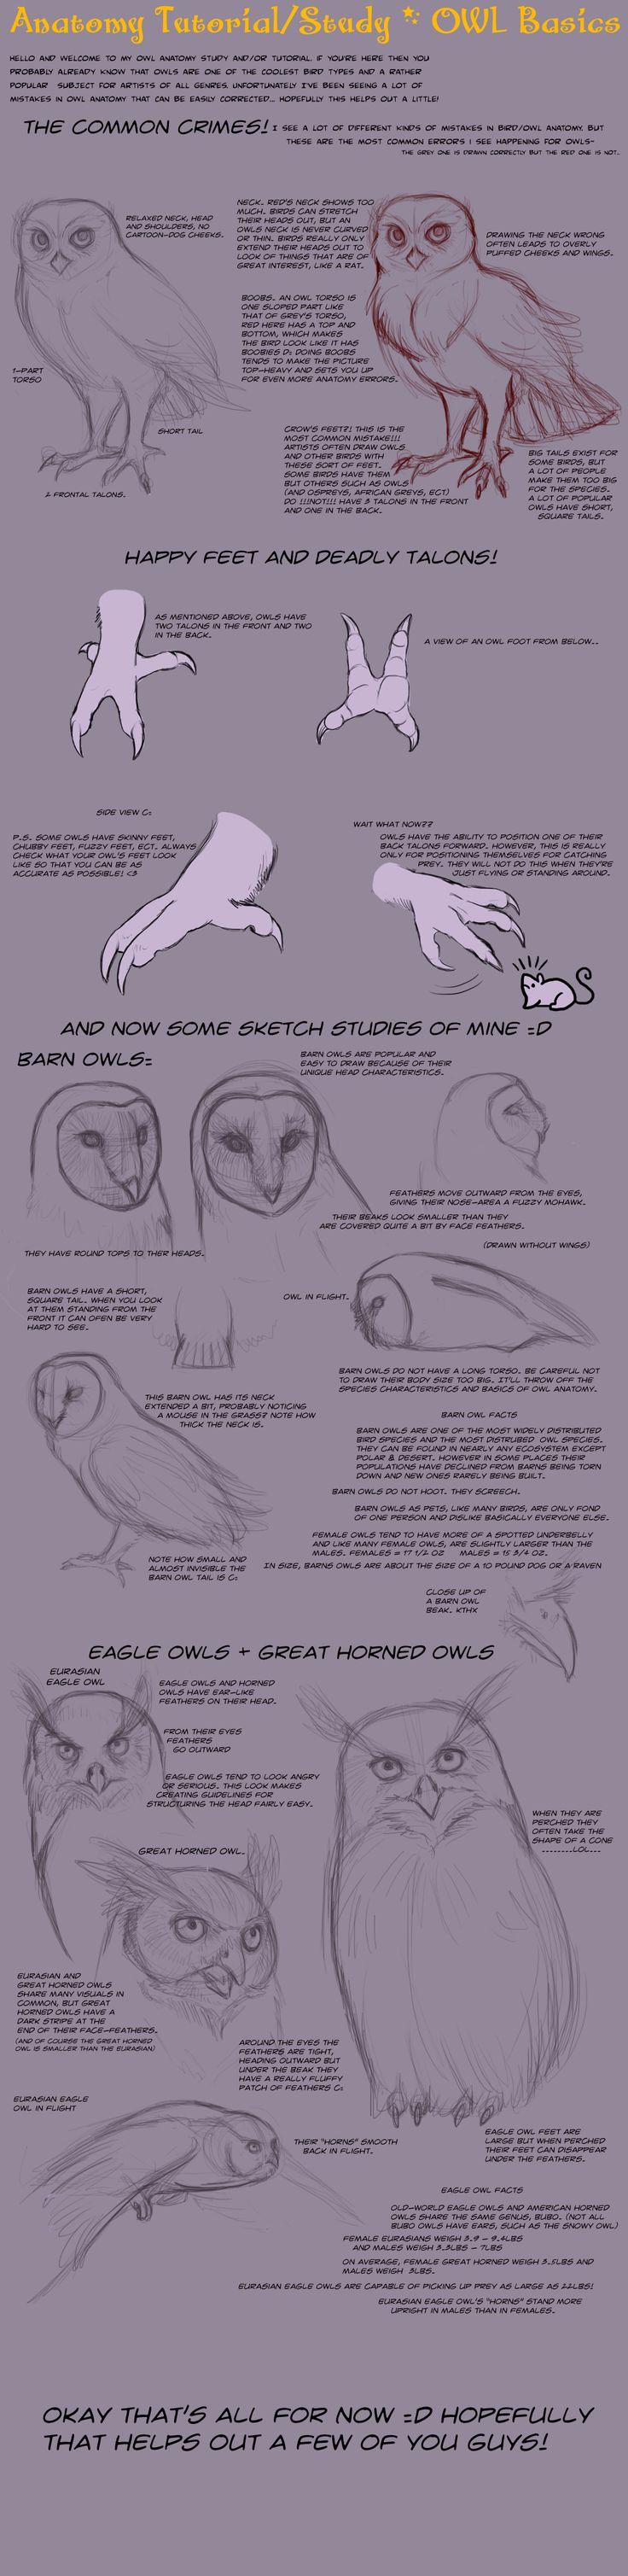 Anatomy Tutorial: Owl Basics by *AddictionHalfWay on deviantART ✤ || CHARACTER DESIGN REFERENCES |